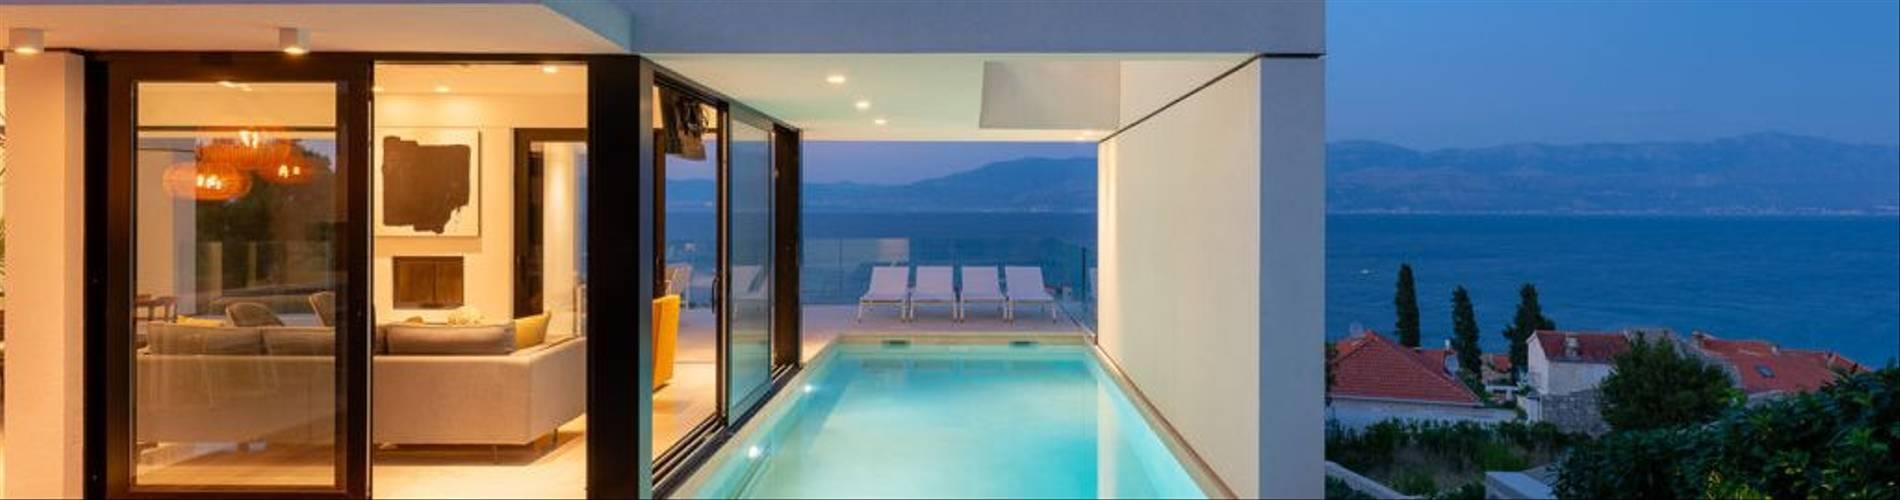 villa-cypres-sutivan-brac-029-1024x683.jpg